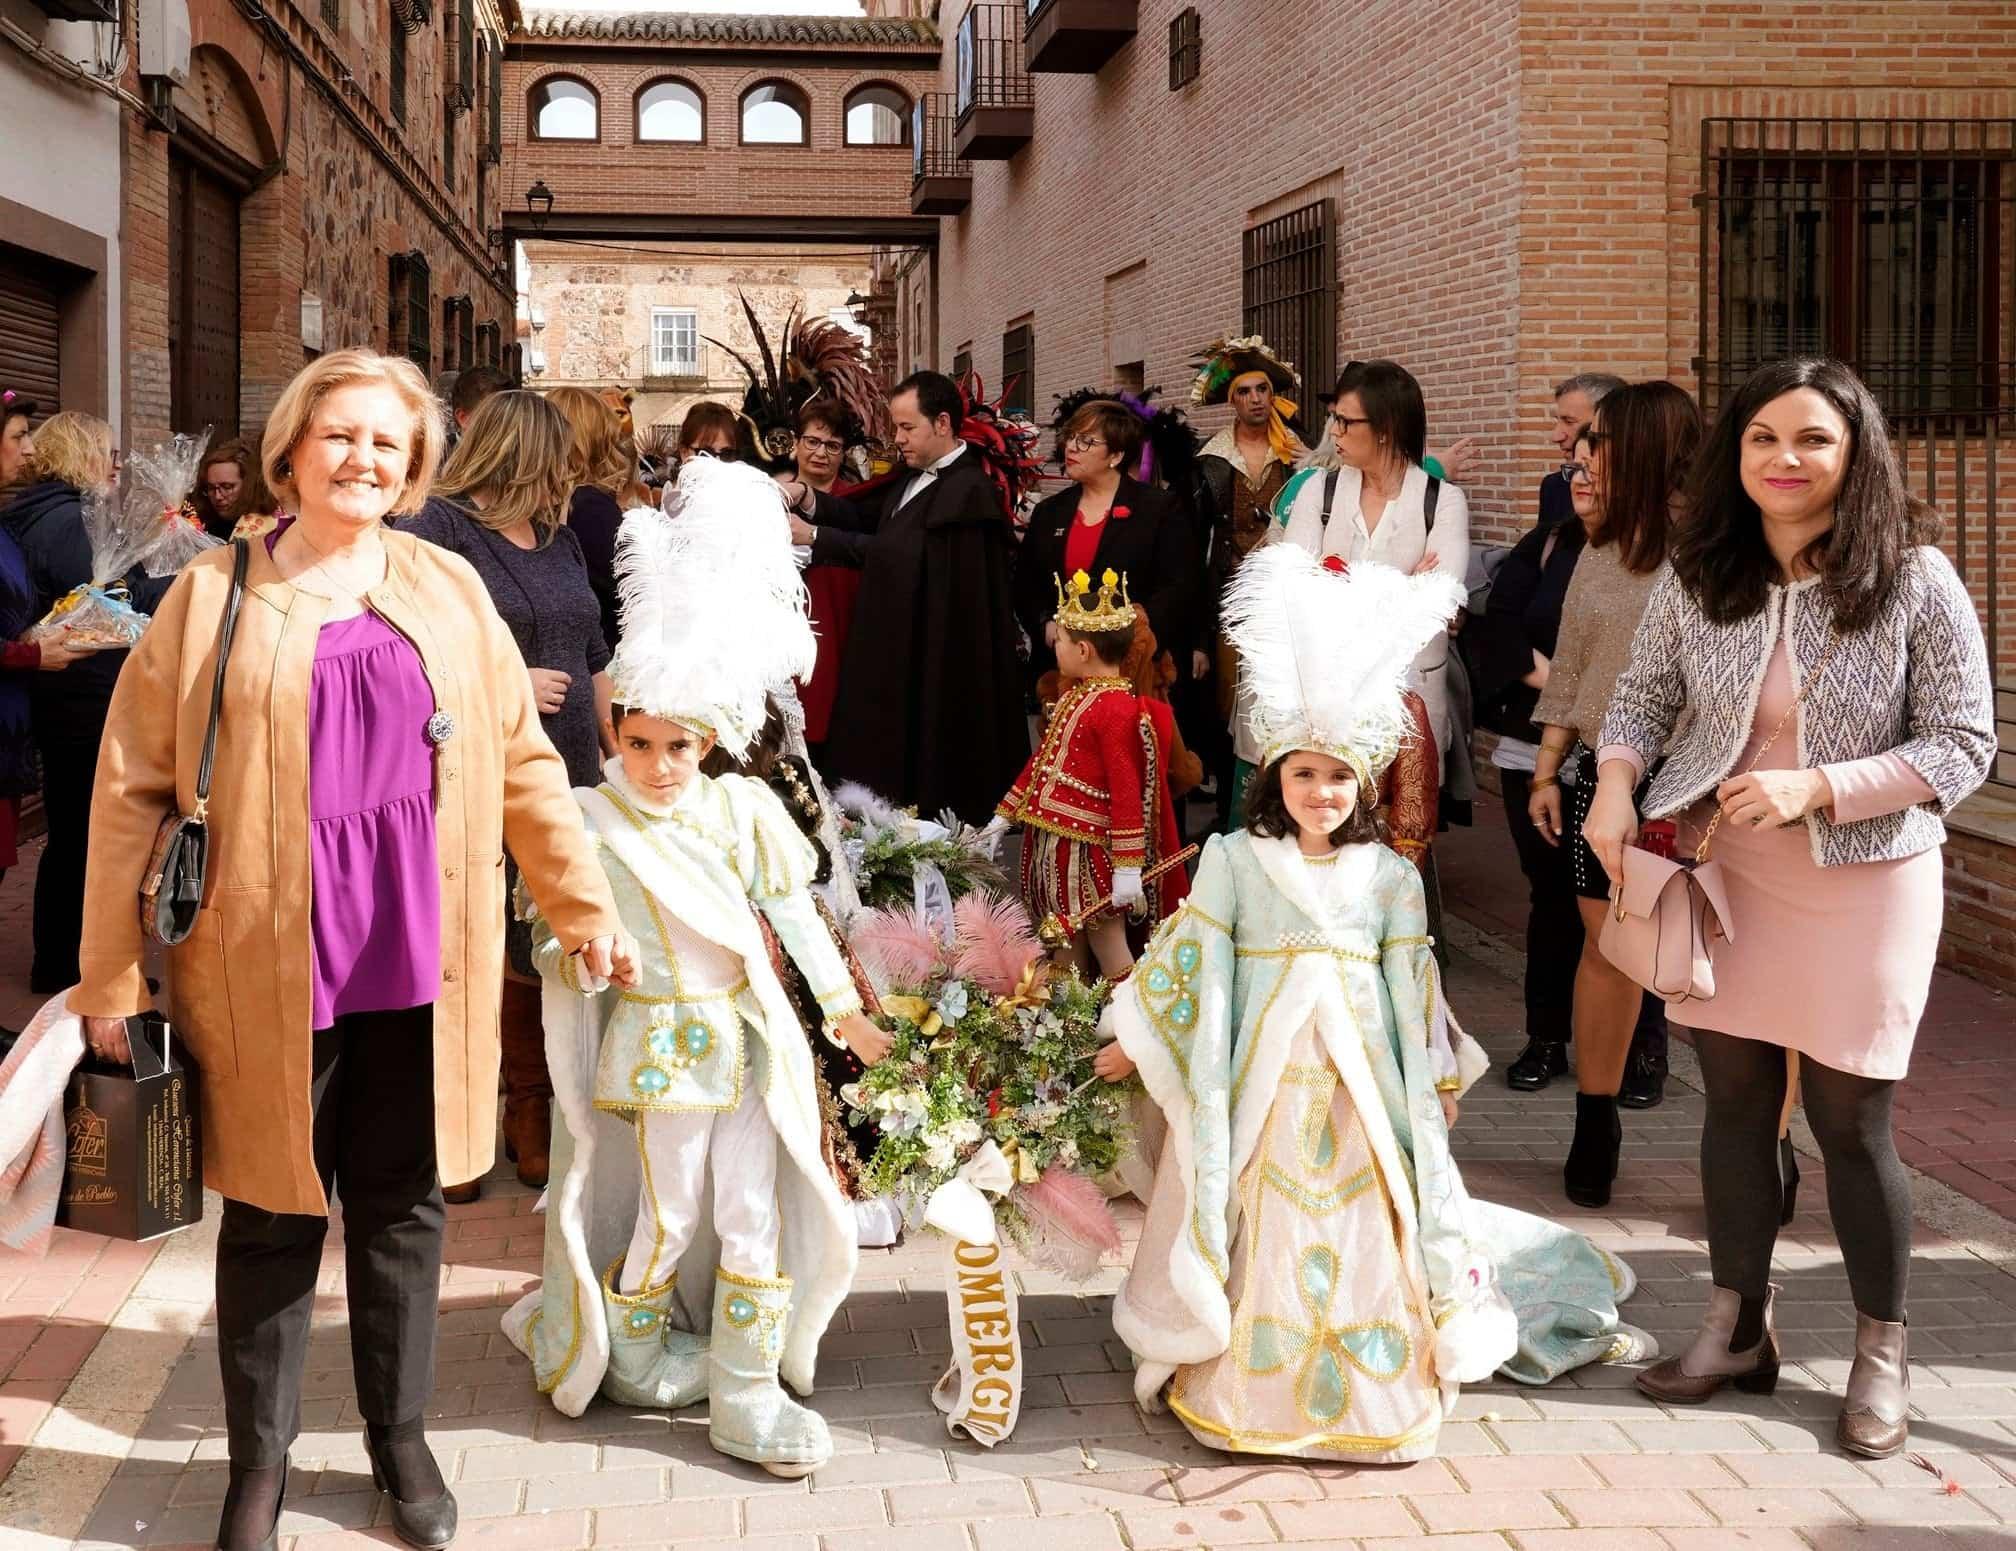 Carnaval de herencia 2020 ofertorio 140 - Selección de fotografías del Ofertorio del Carnaval de Herencia